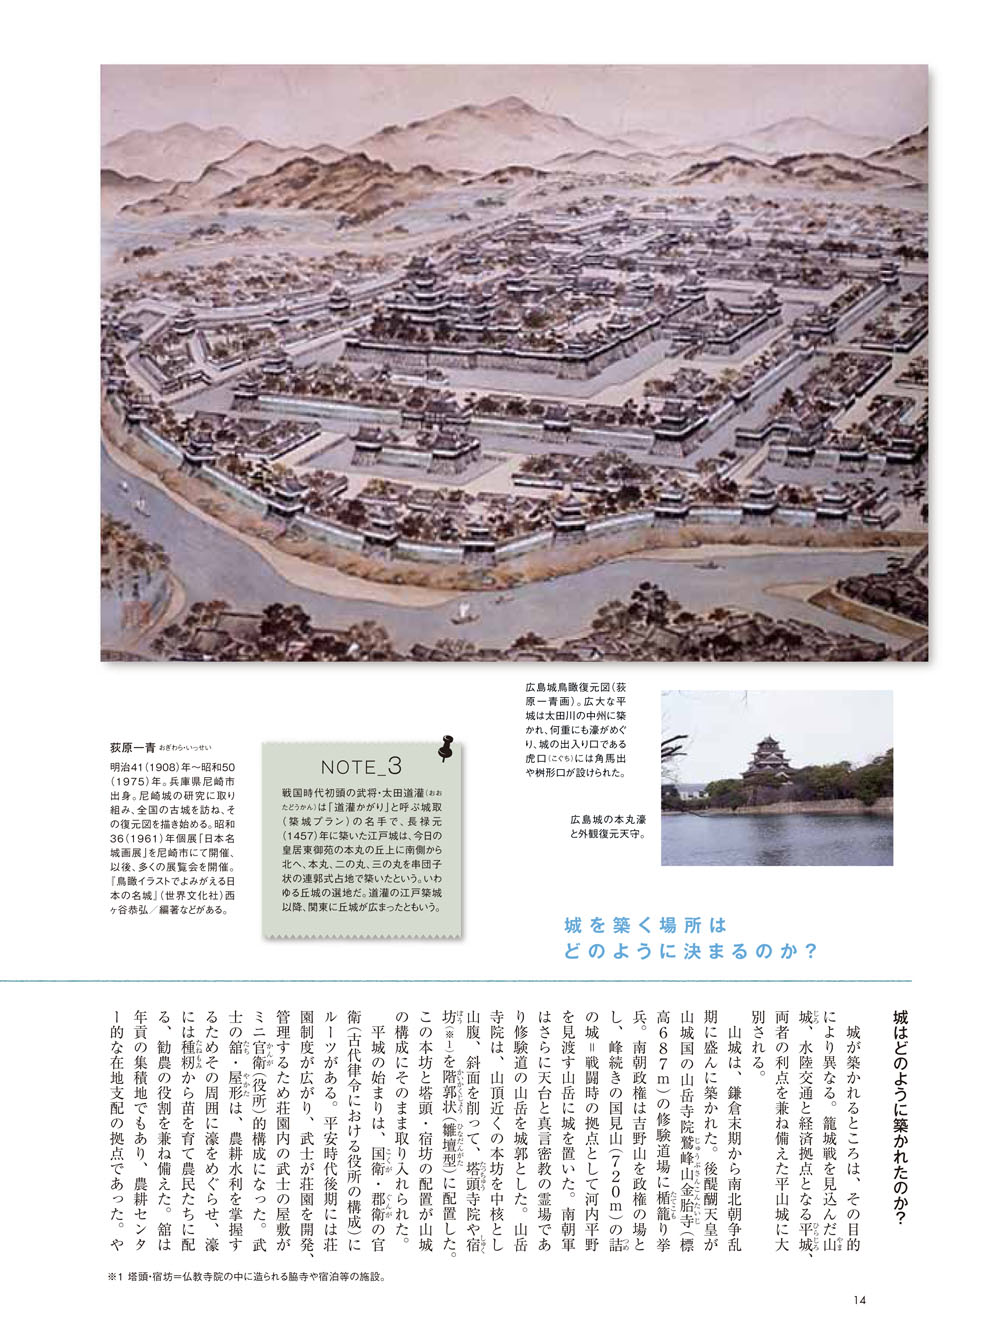 YUCARI_26_14.jpg